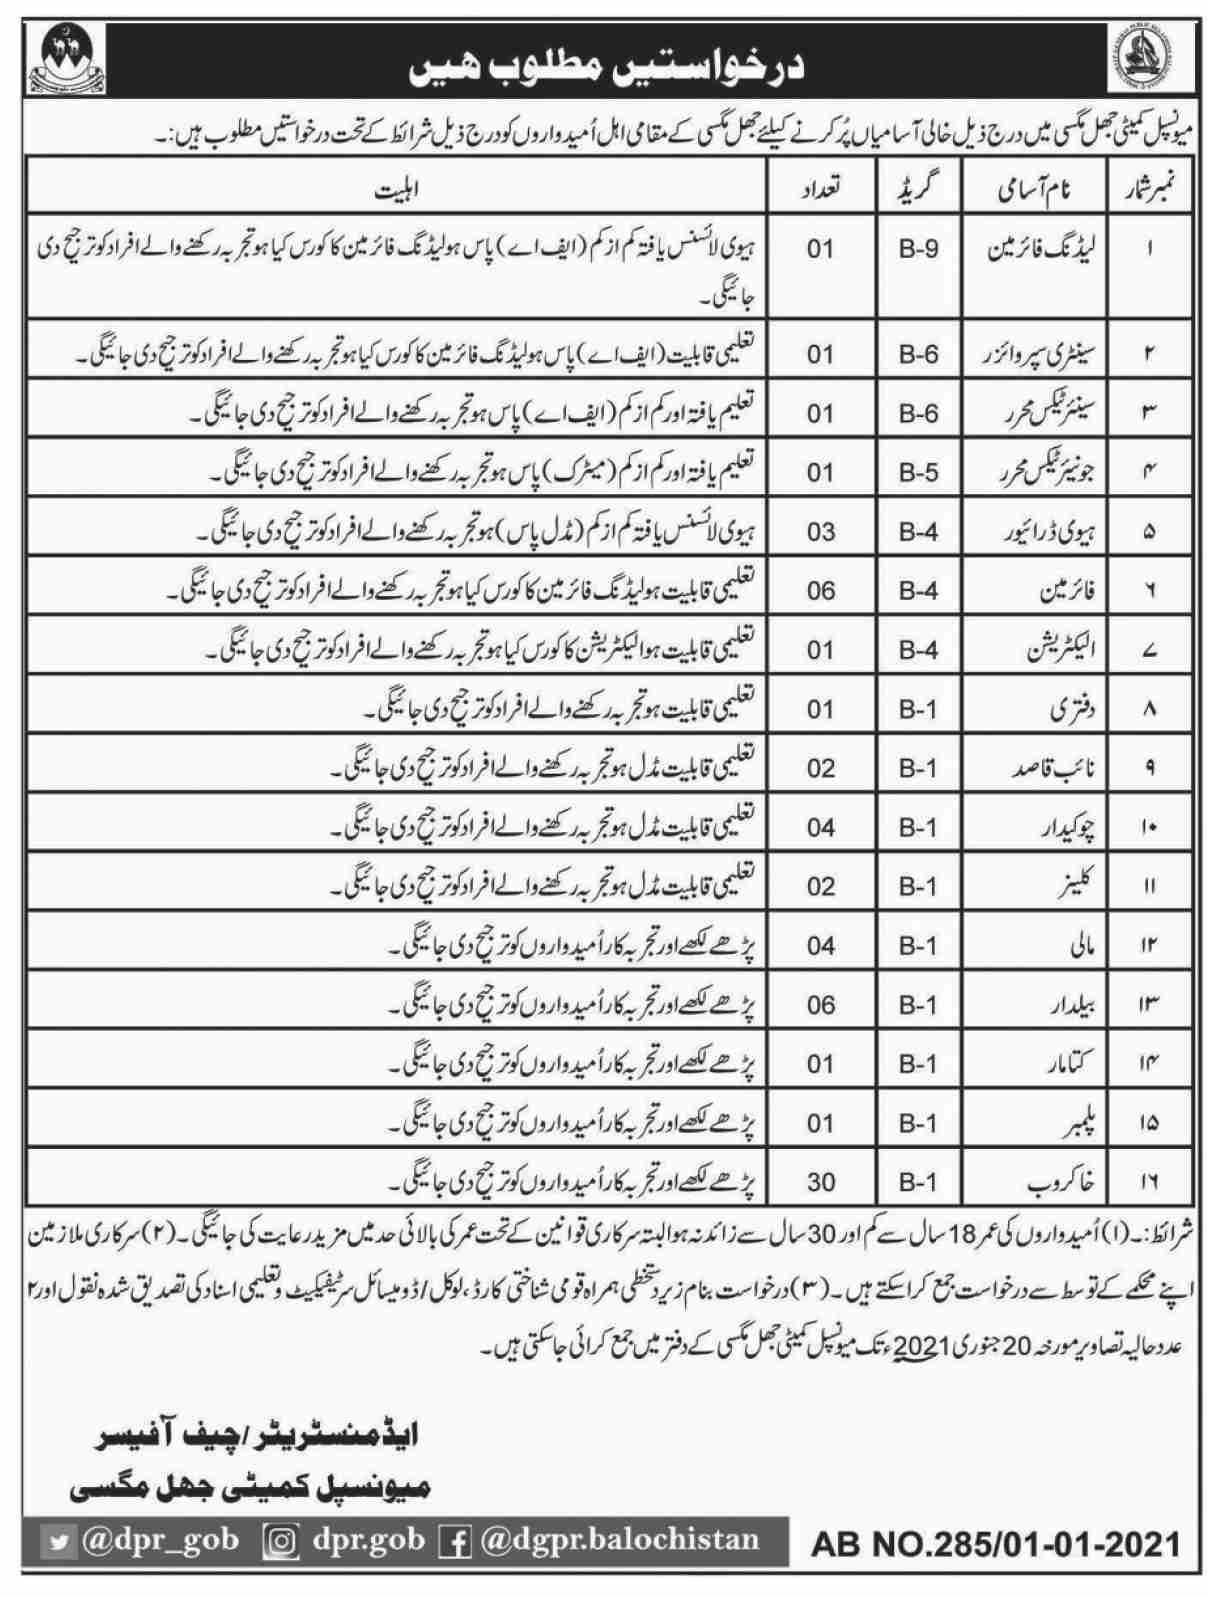 Municipal Committee Jobs 2021 - Jhal Magsi Jobs 2021 - Government of Balochistan Jobs 2021 - Support Staff Jobs in Pakistan 2021